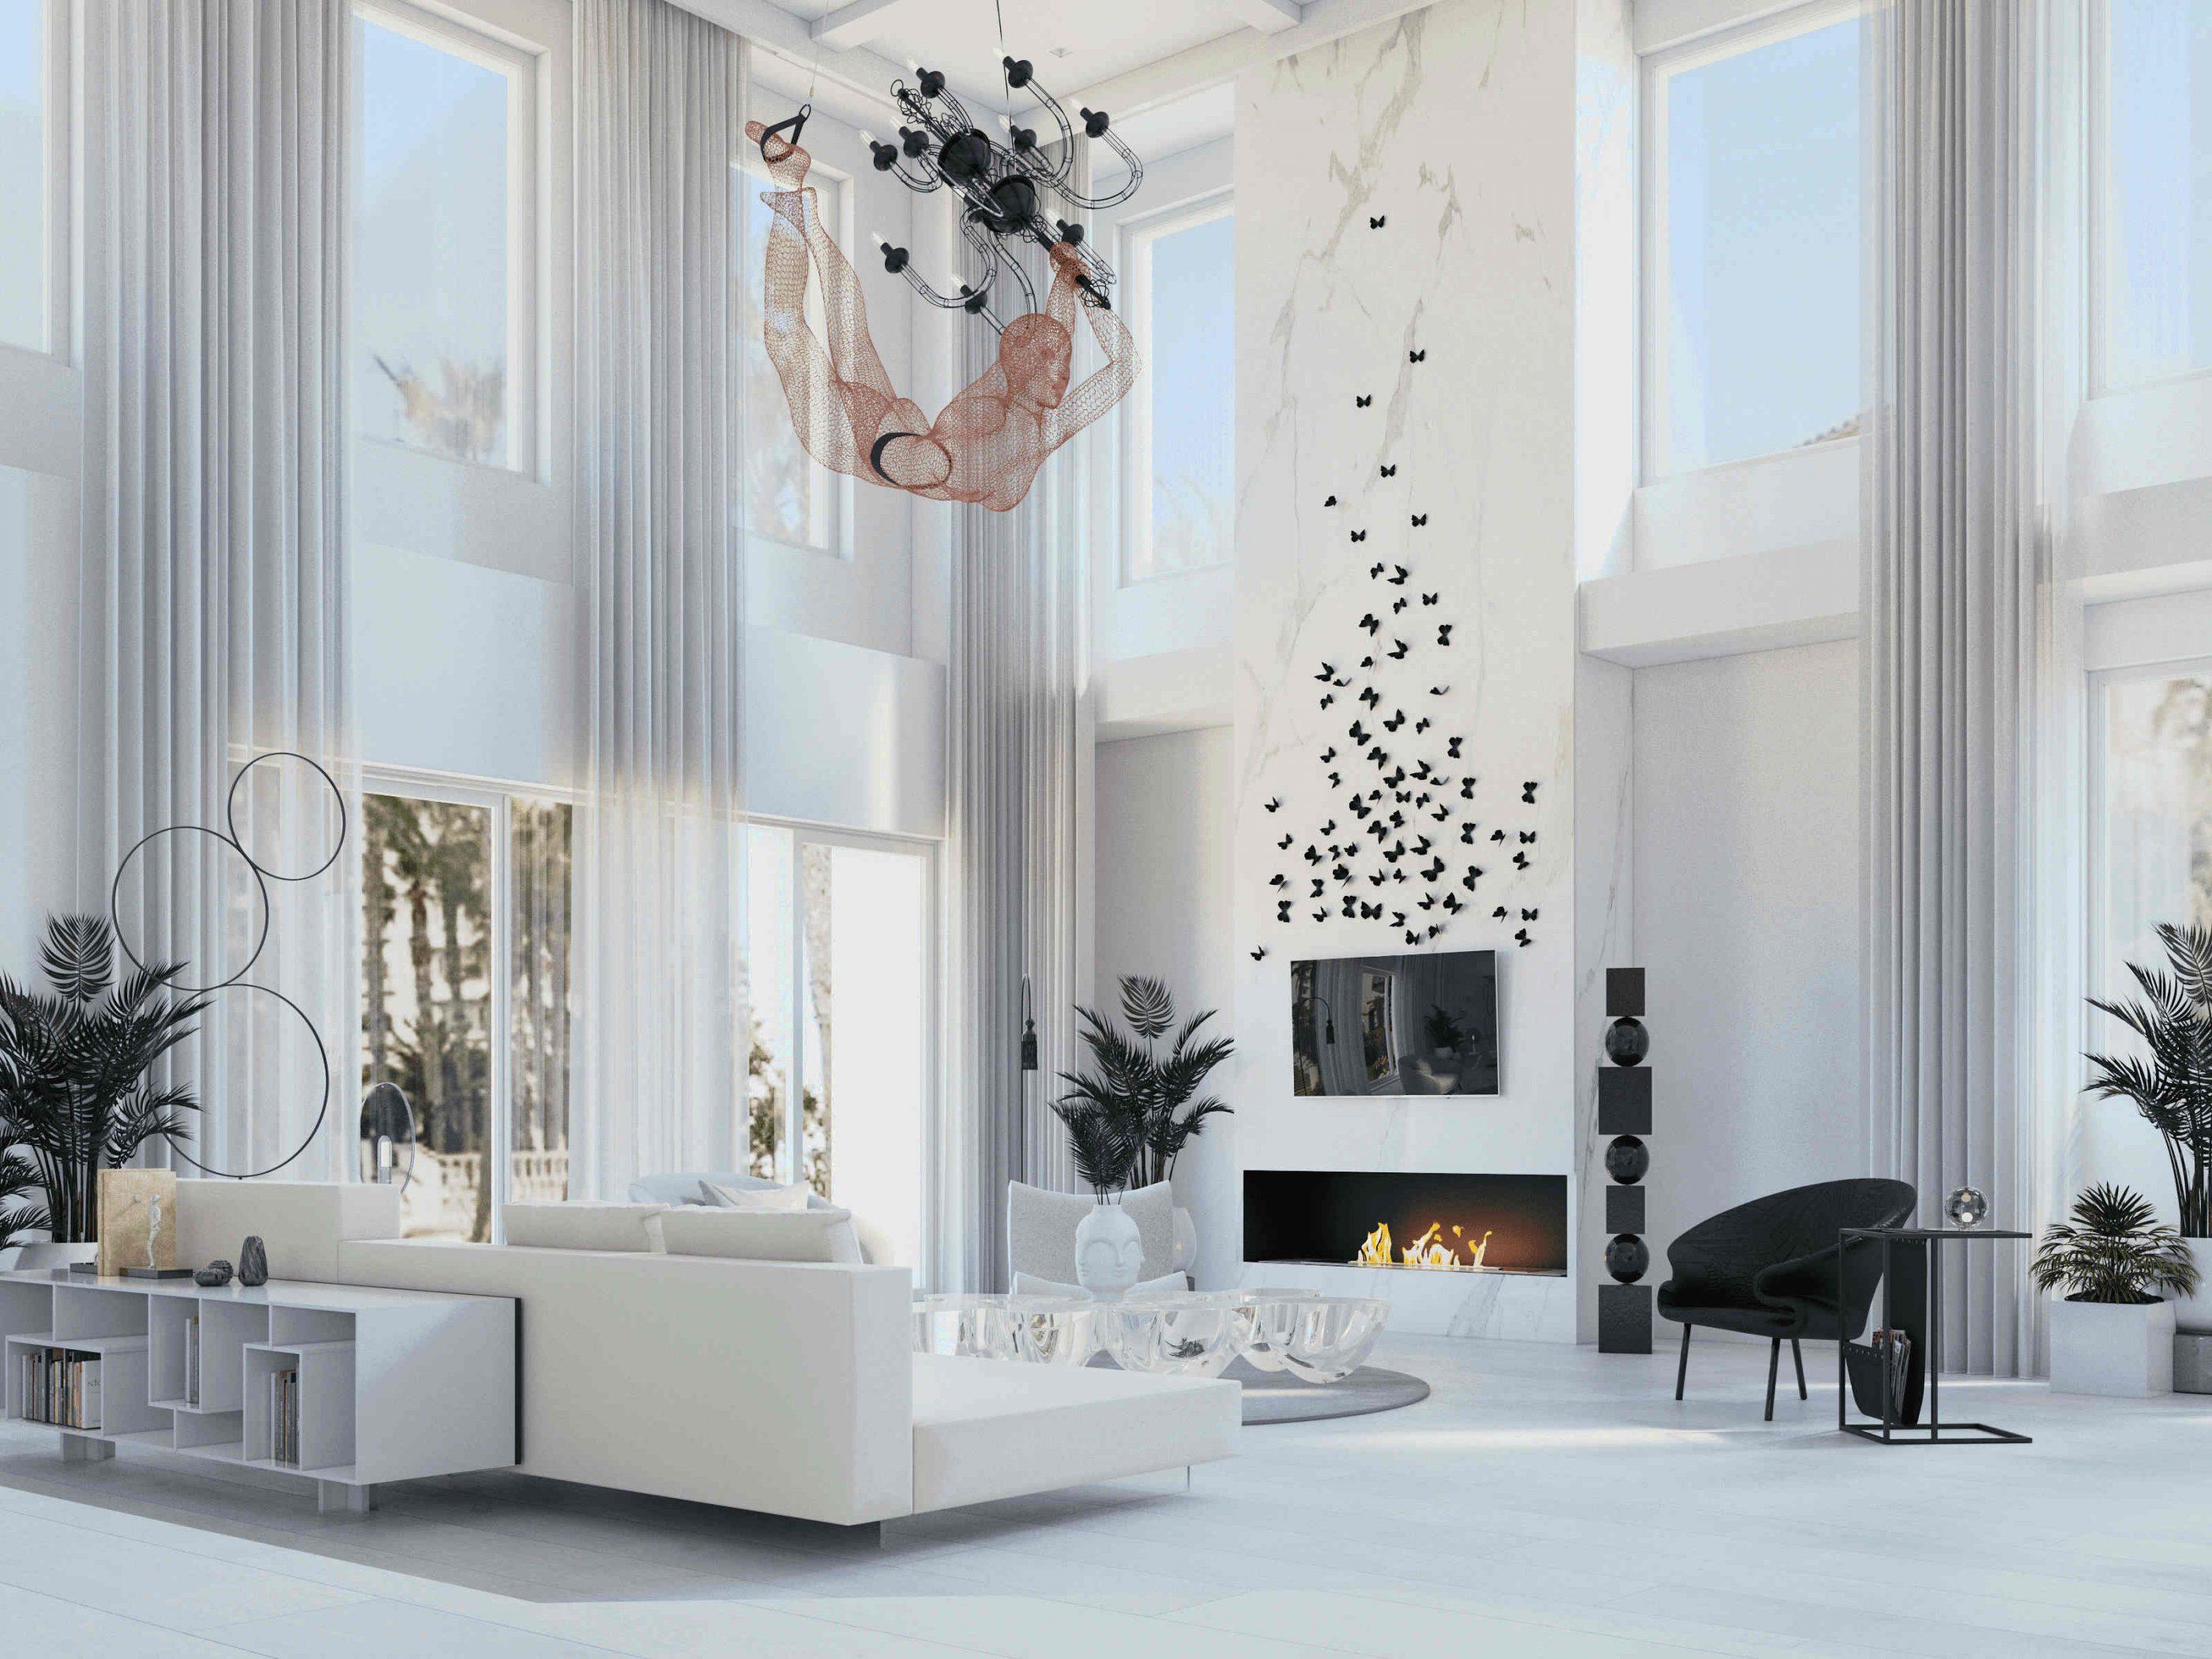 Interior Designer Los Angeles Newport Beach Brana Designs